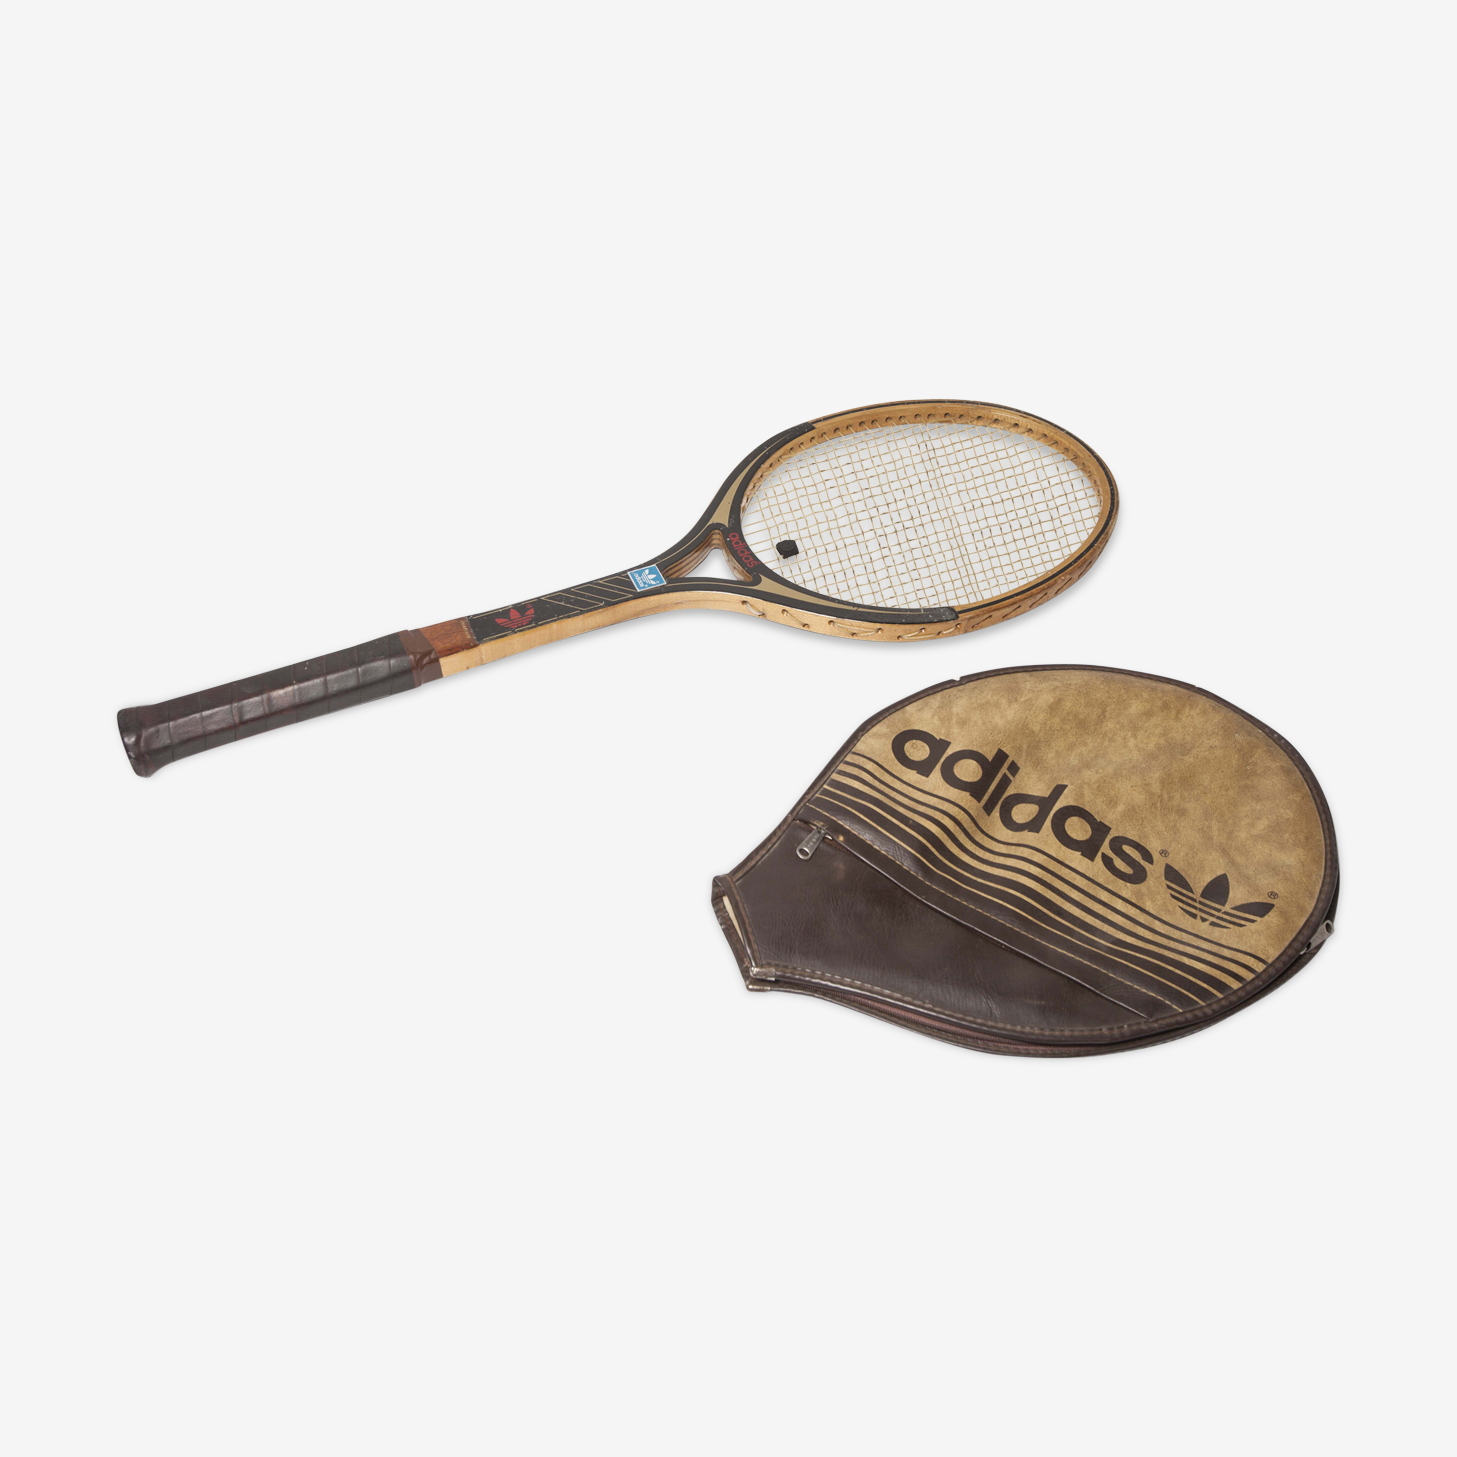 Raquette tennis Adidas, 70s, Graphite ADS 075